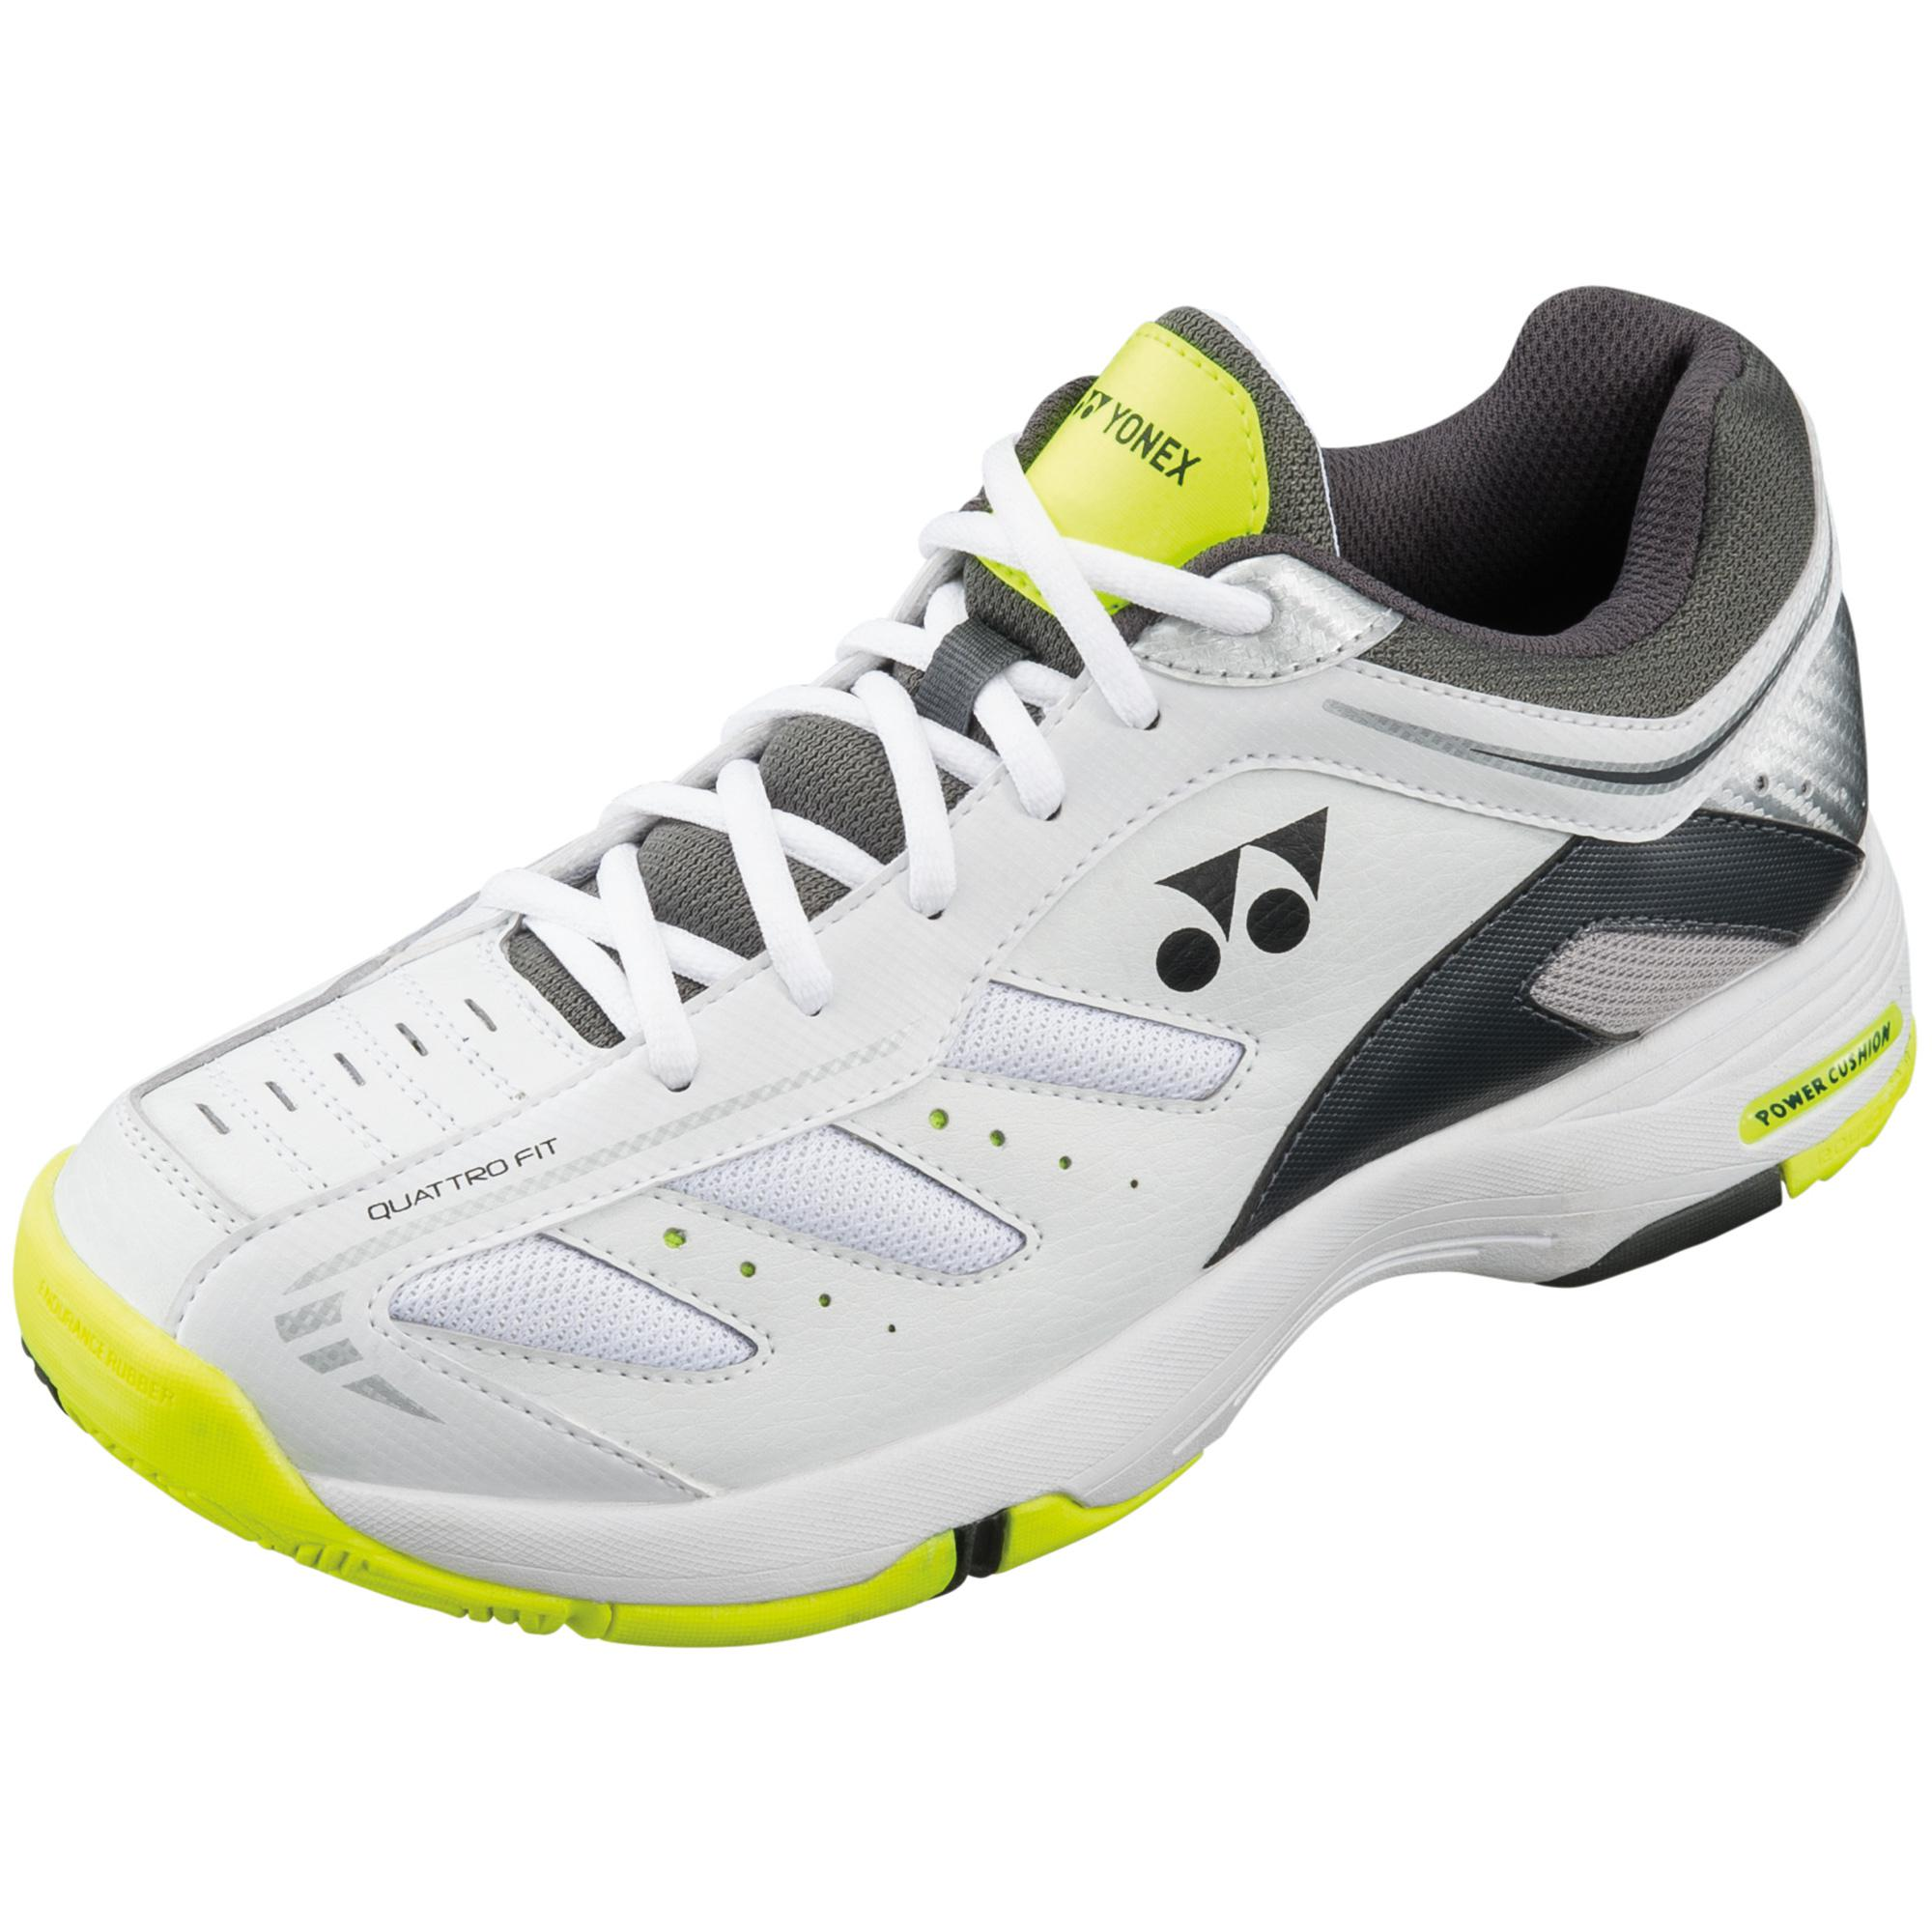 yonex mens sht cefiro all court tennis shoes white